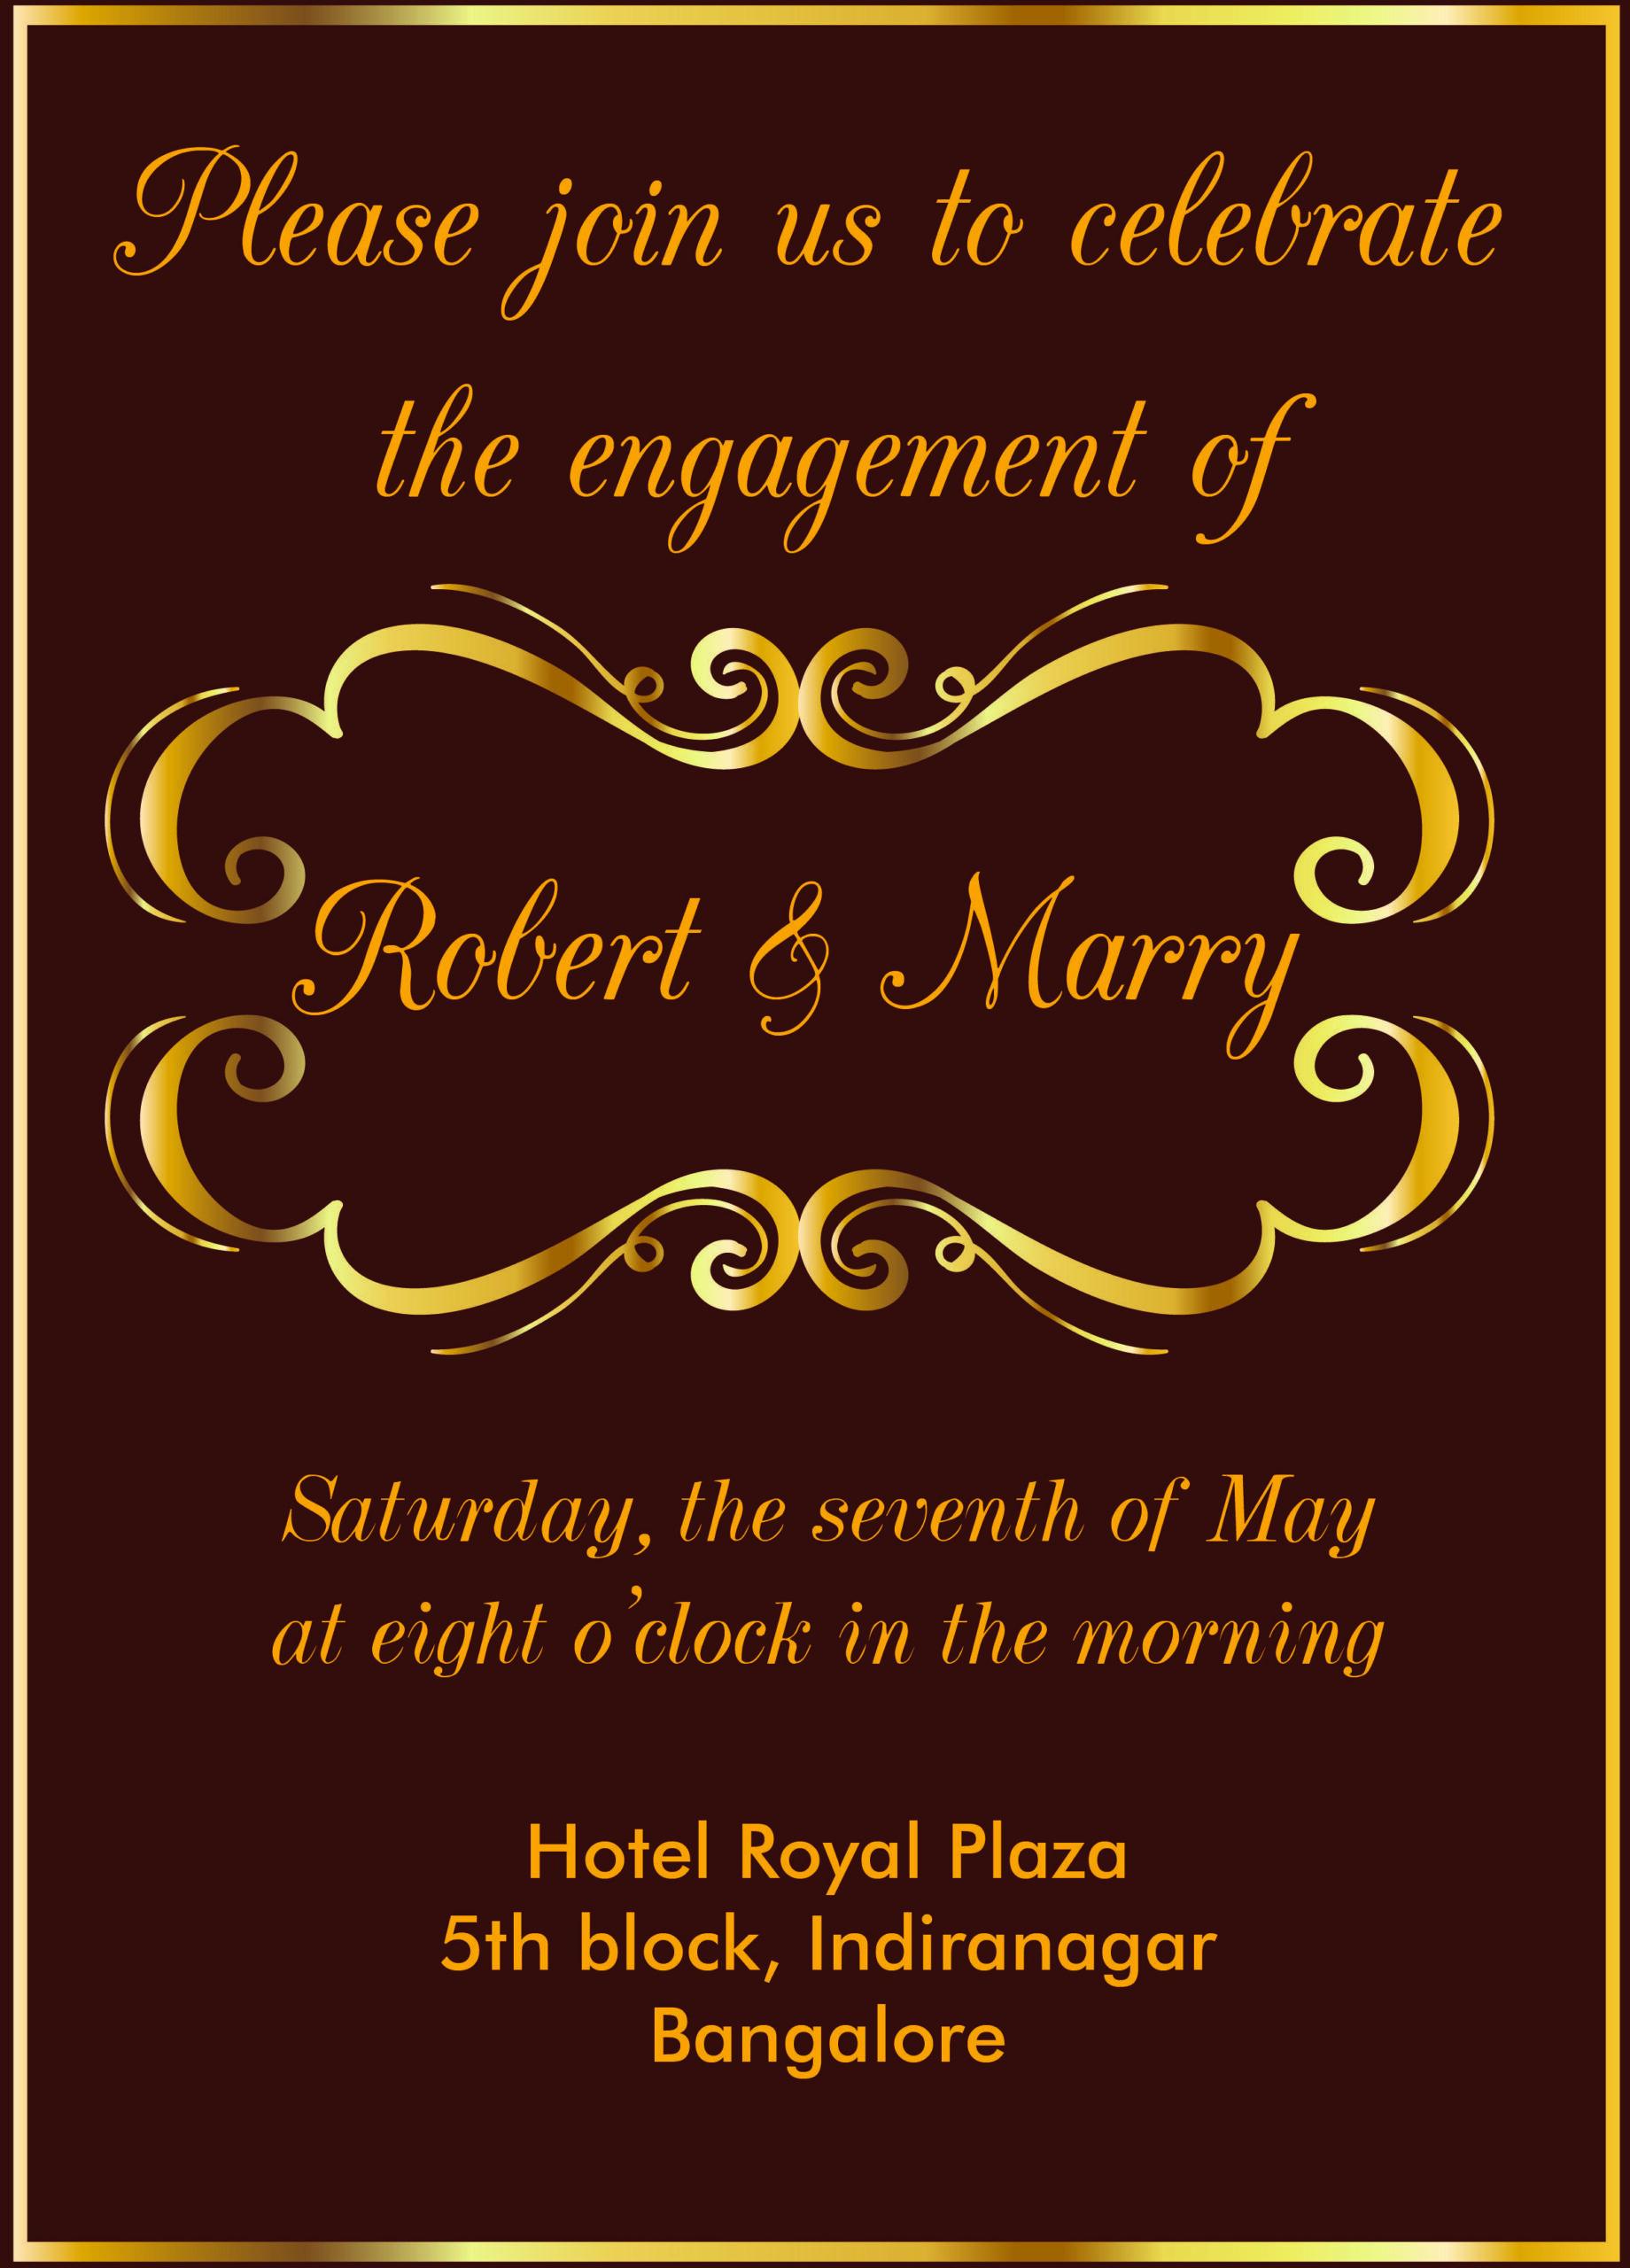 10 New Ideas Engagement Card Invitation Maker Engagement Invitations Engagement Invitation Message Engagement Invitation Cards